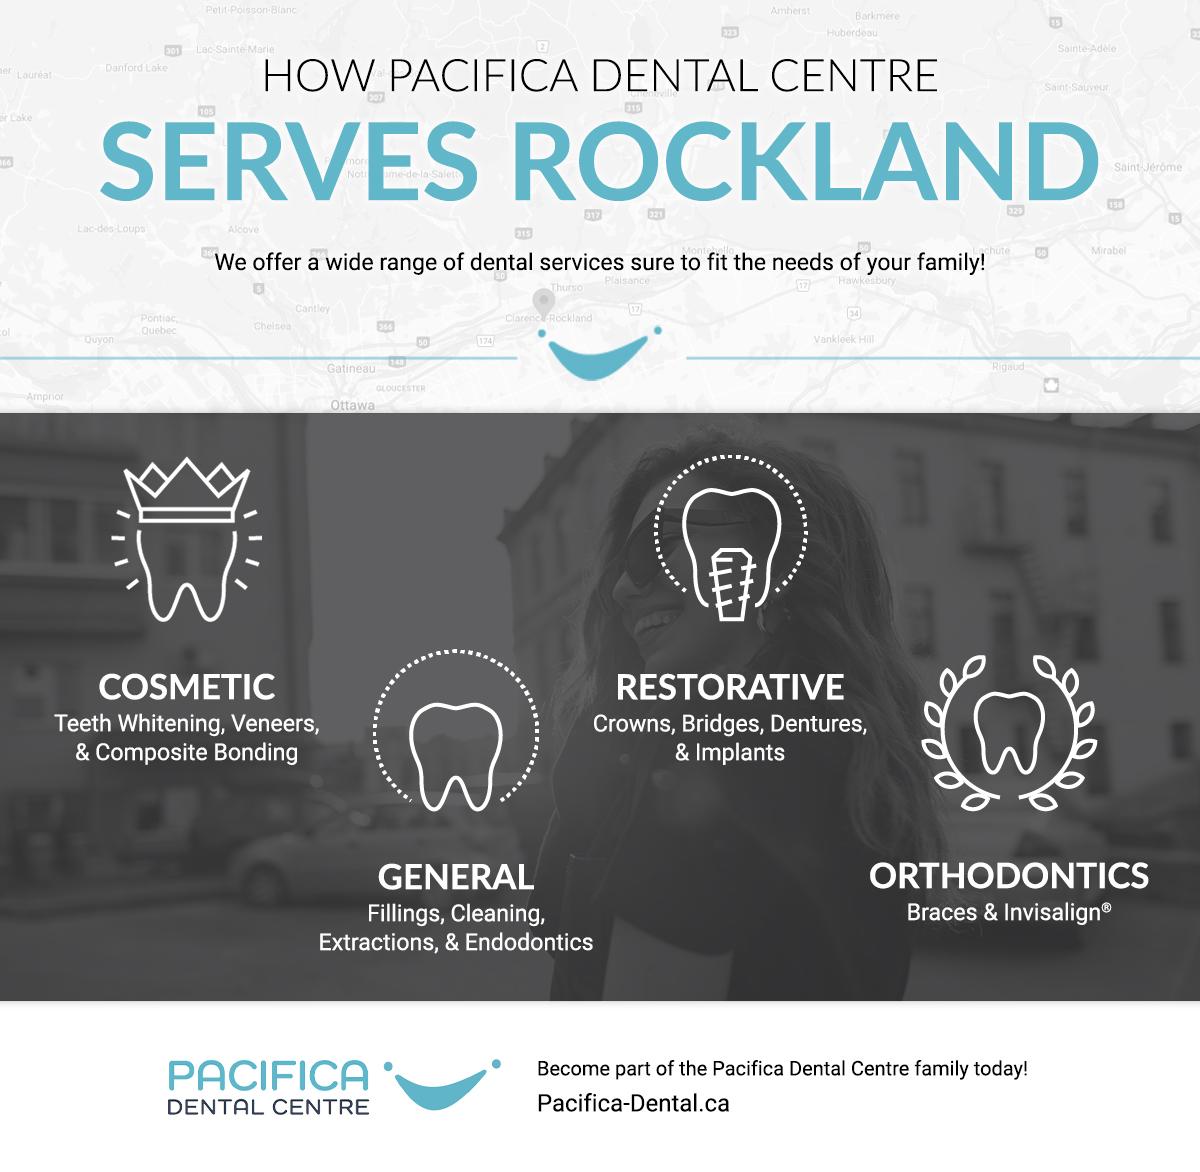 Pacifica Dental Centre In Rockland